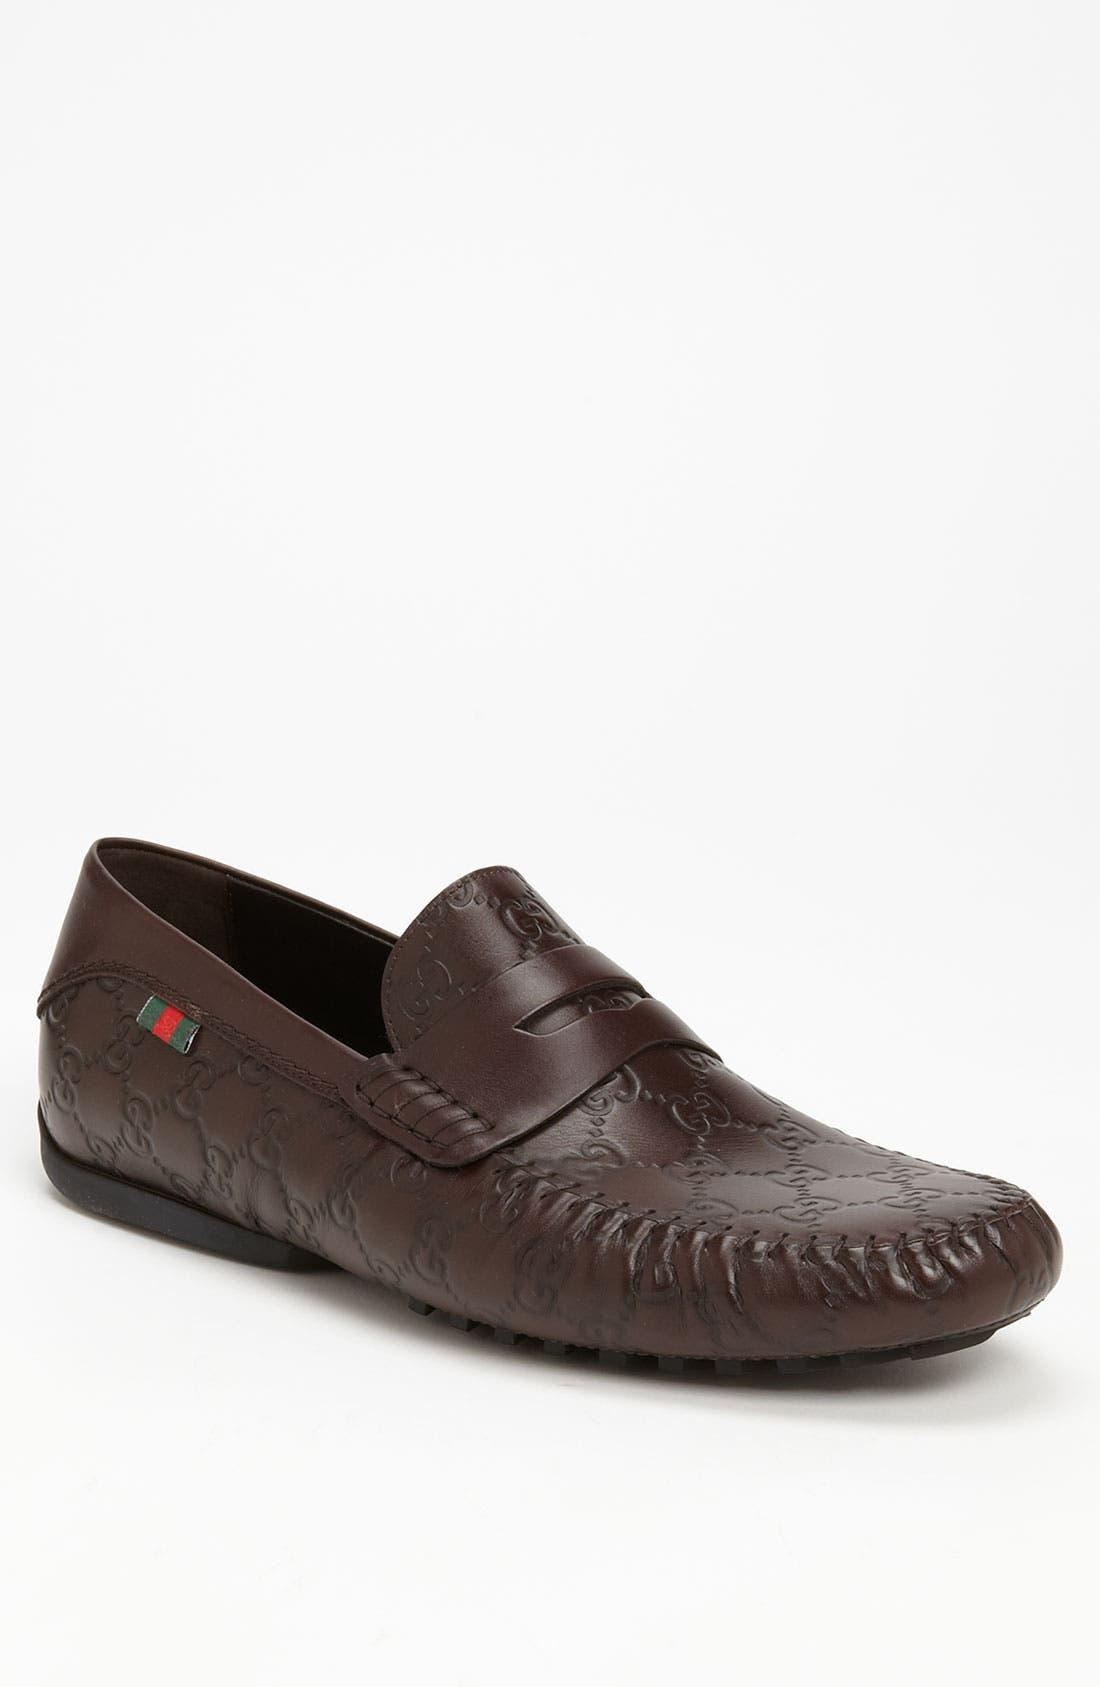 Main Image - Gucci 'San Marino' Driving Shoe